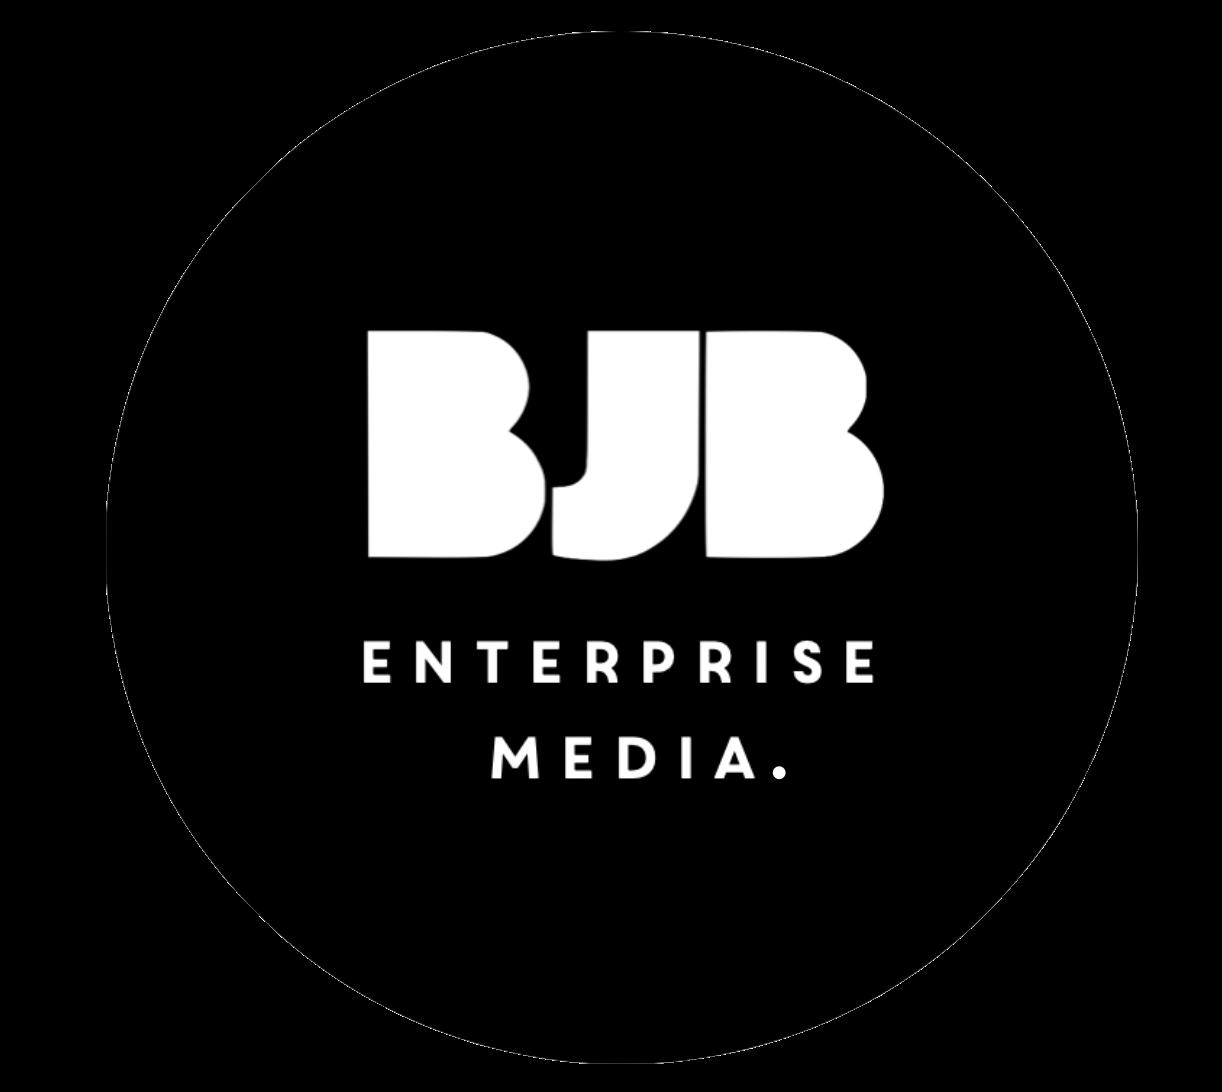 about bjb enterprise media about bjb enterprise media